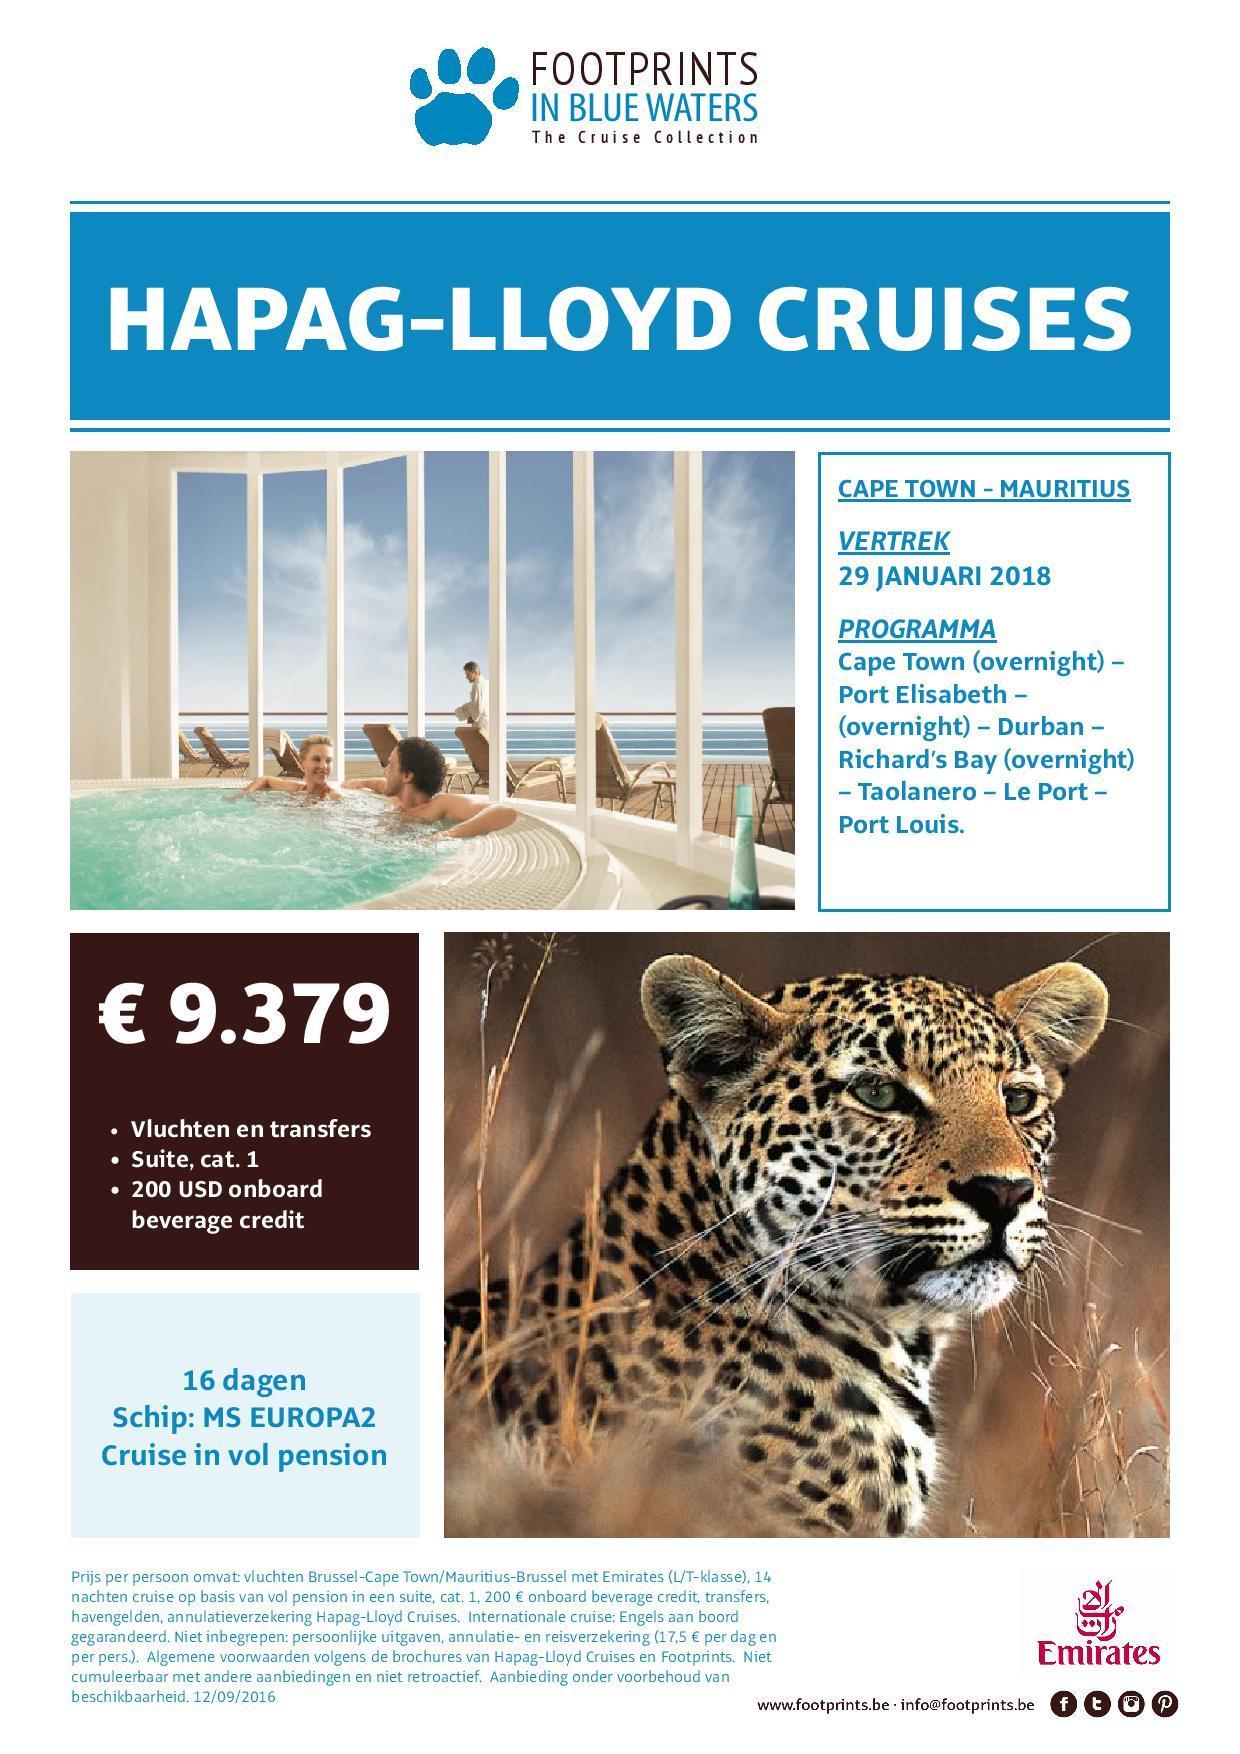 Cruise: Cape Town - Mauritius